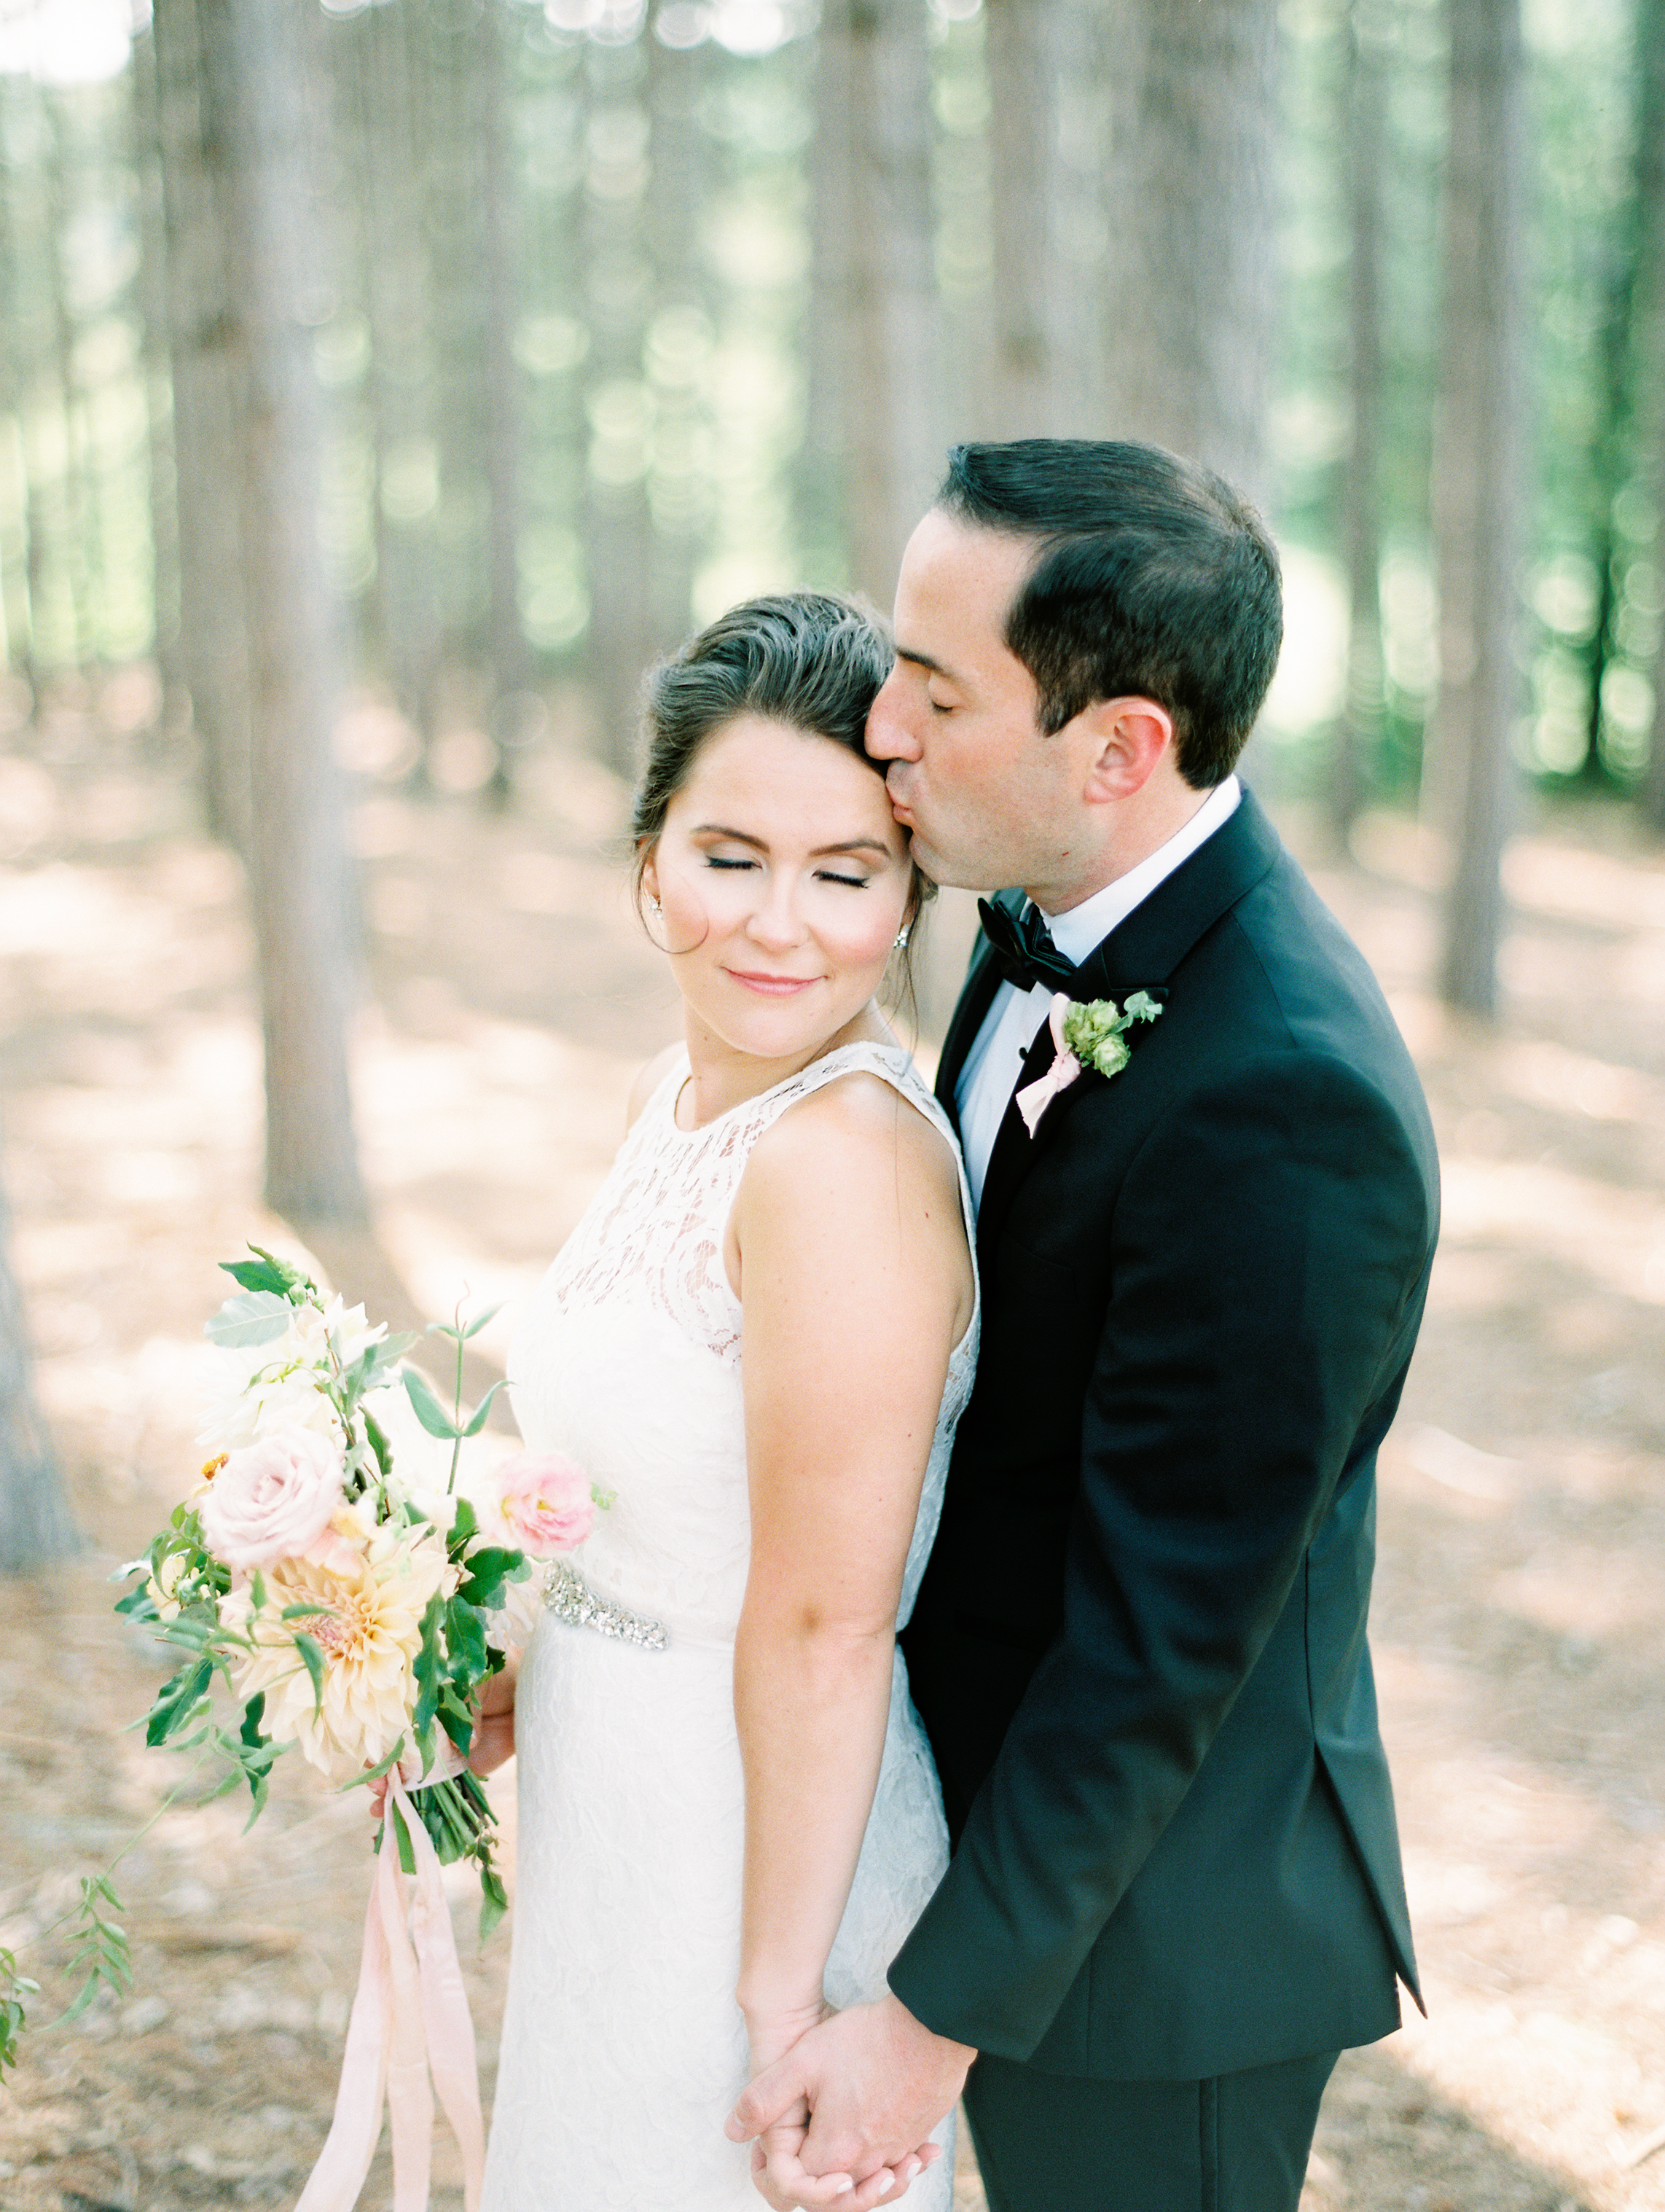 Zoller+Wedding+Bridal+Partyf-14.jpg